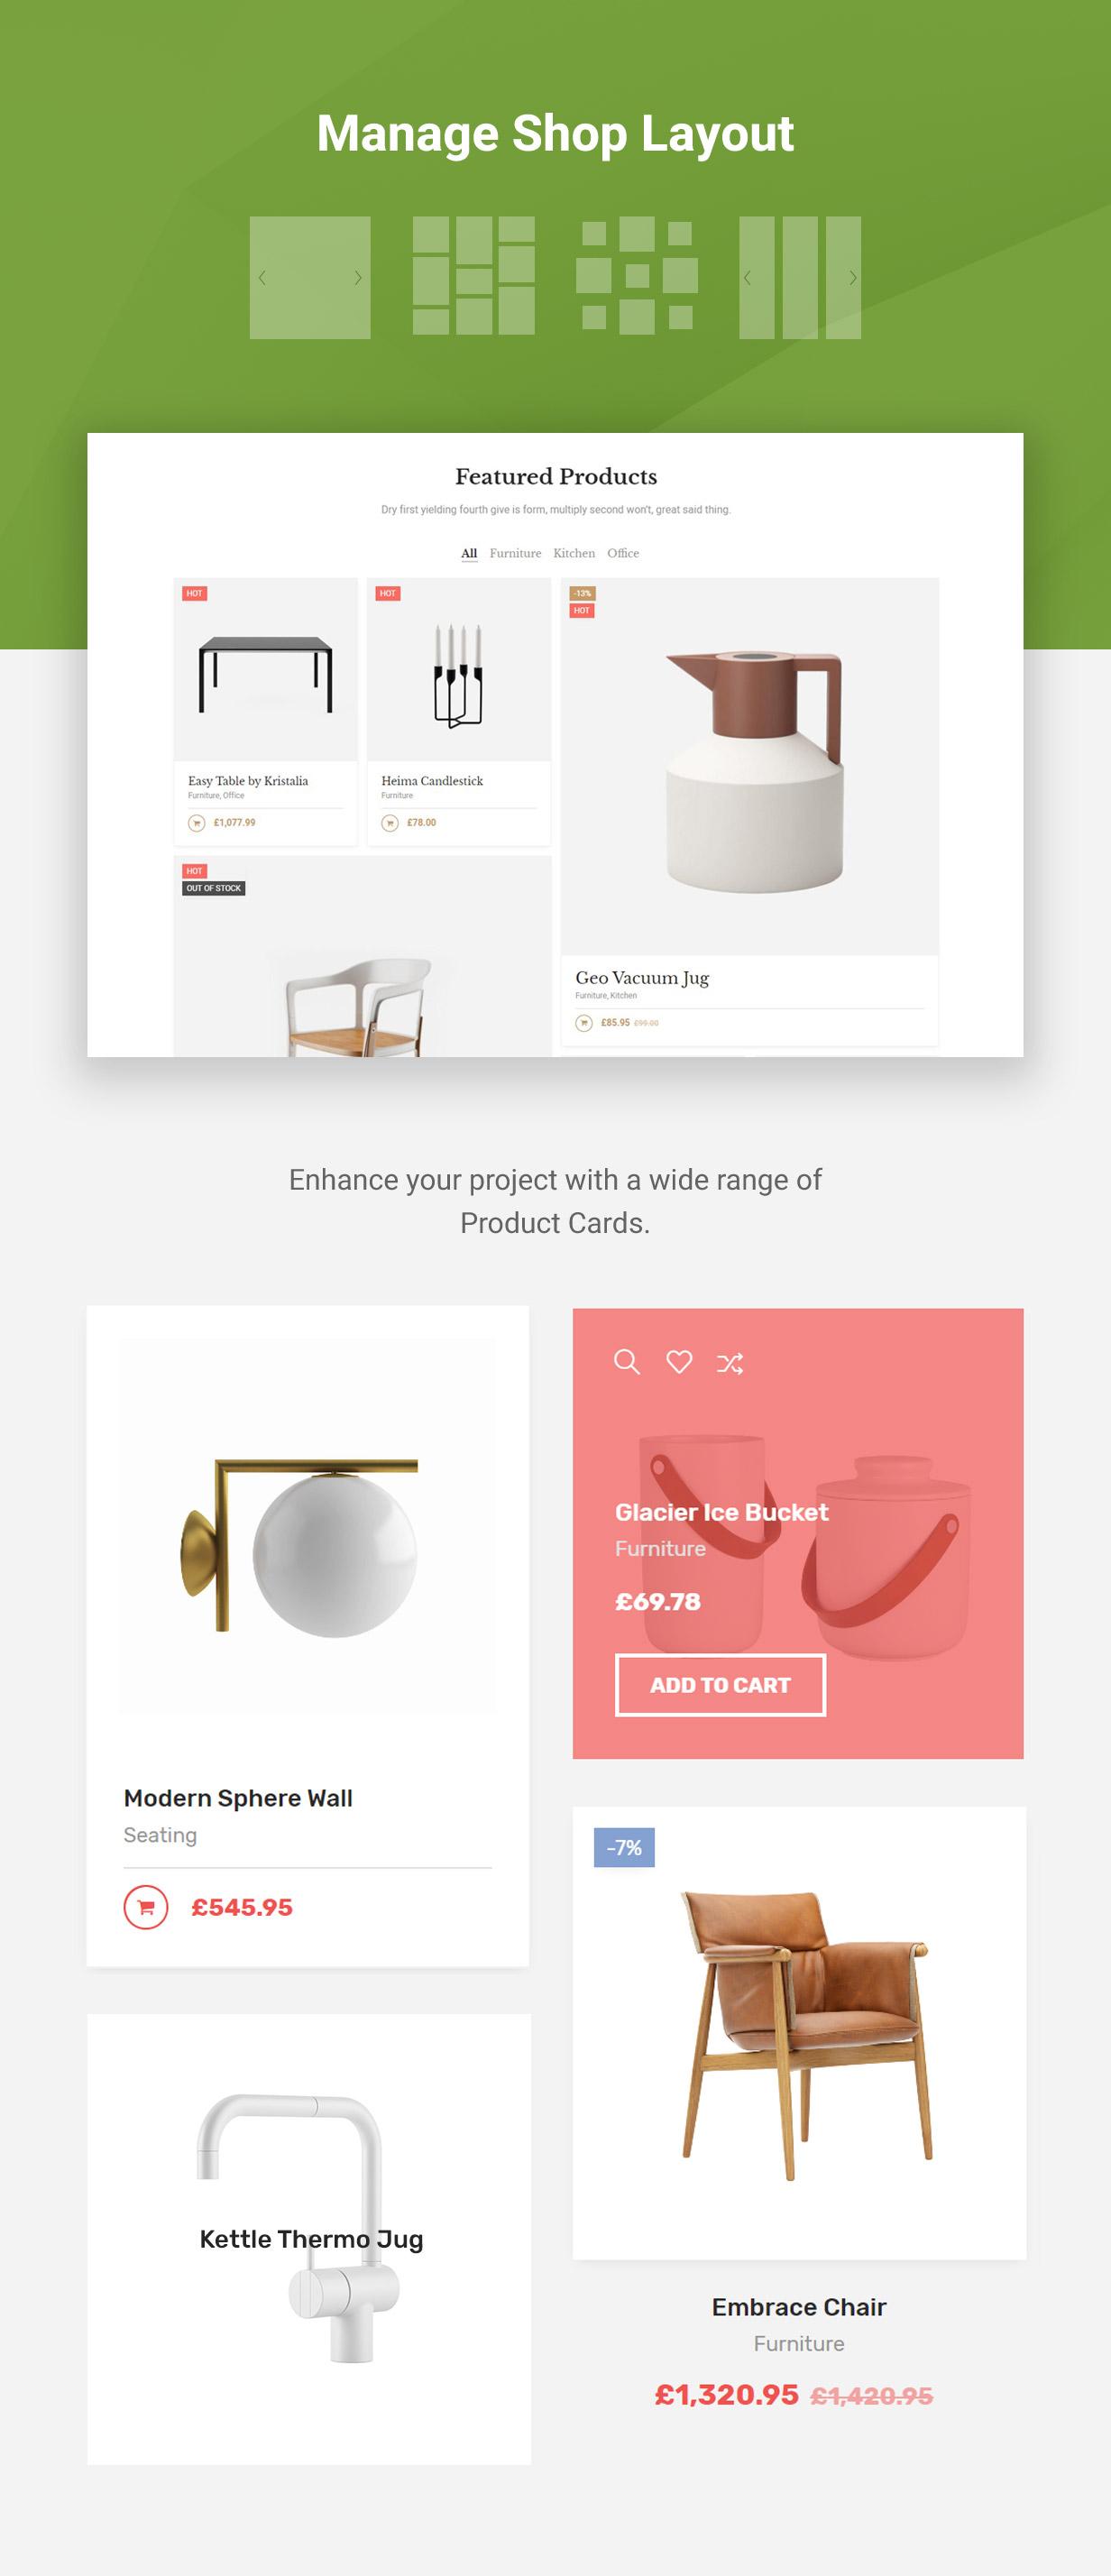 Nels - Ein exquisites eCommerce WordPress Template - 5